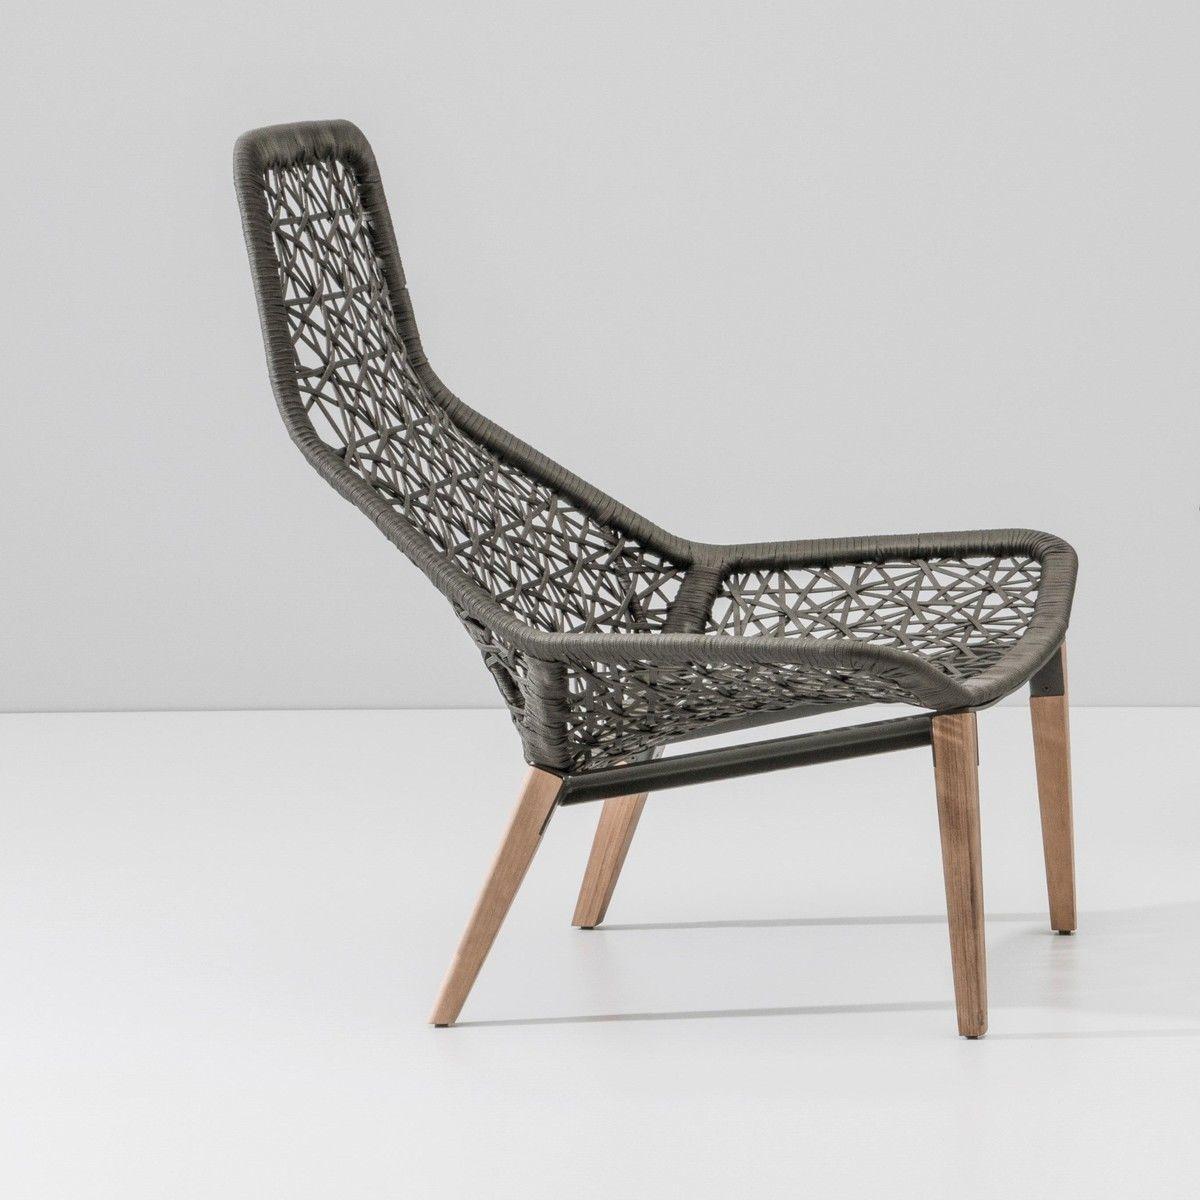 Maia relax garden armchair wooden base kettal for Kettal maia chair